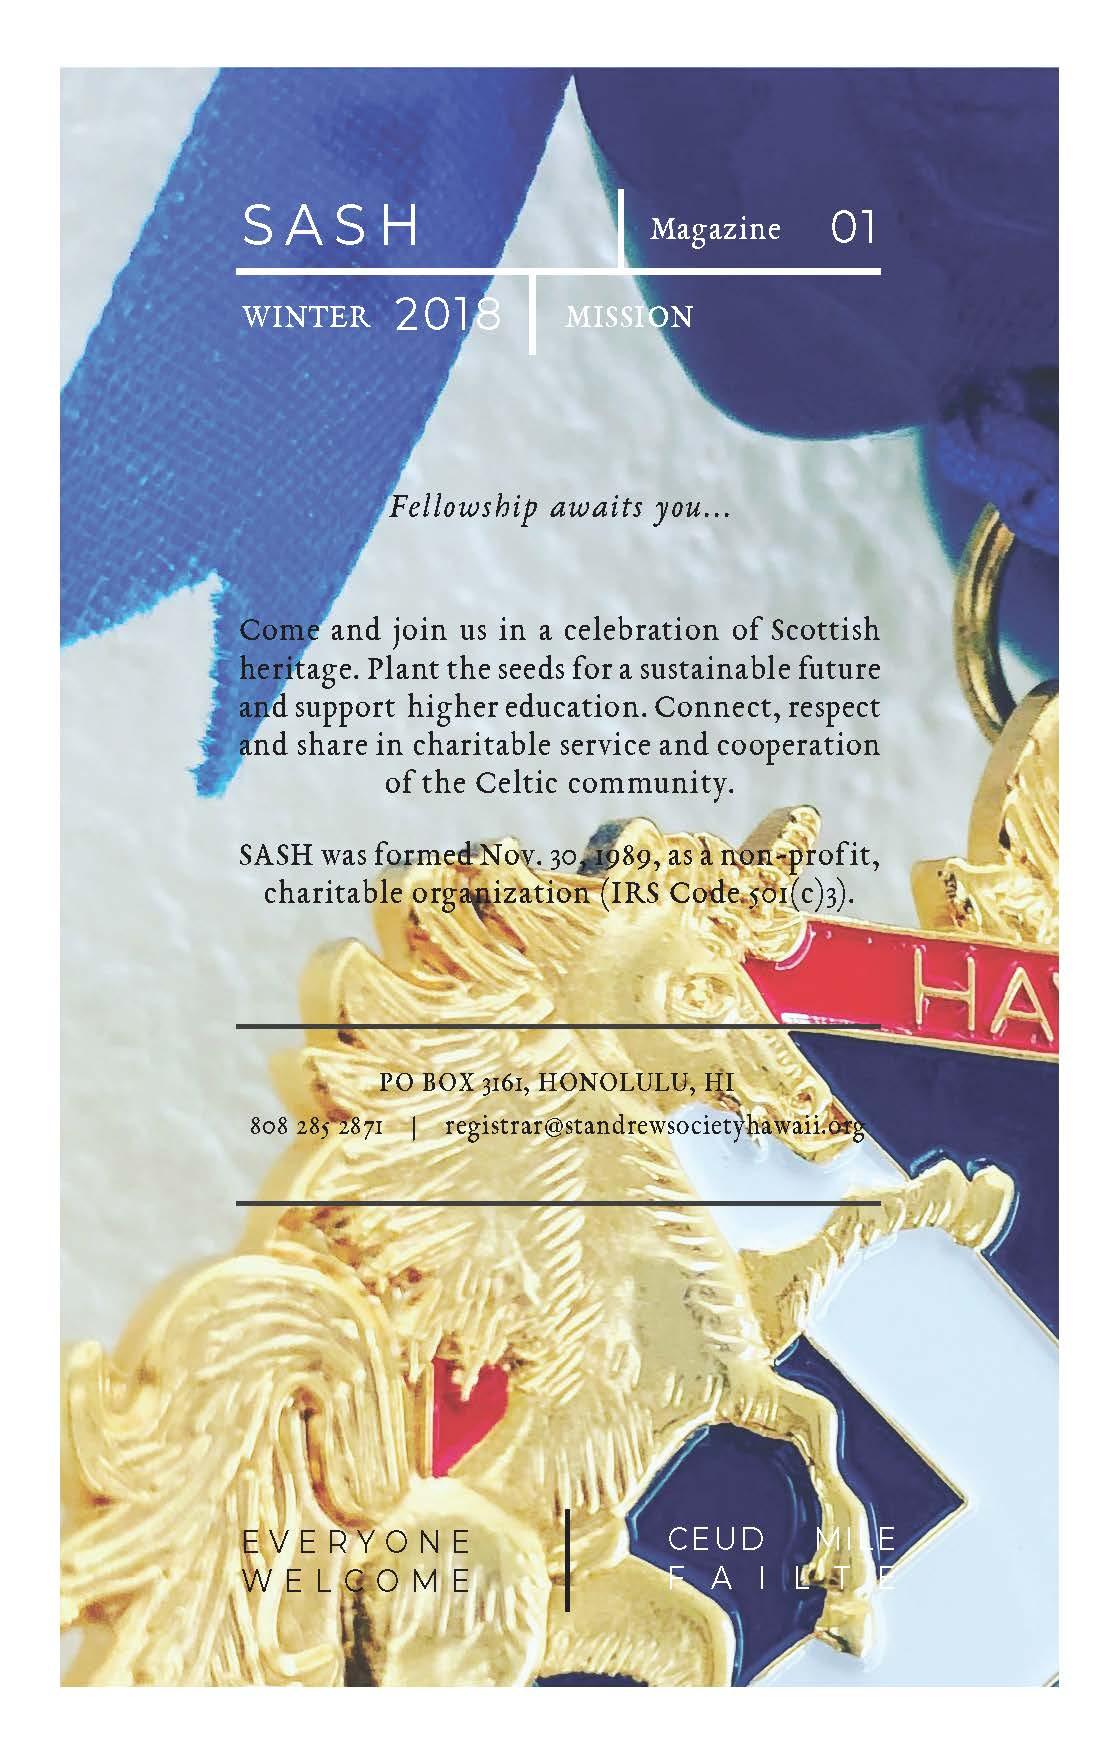 SASH Magazine 01_Page_1.jpg